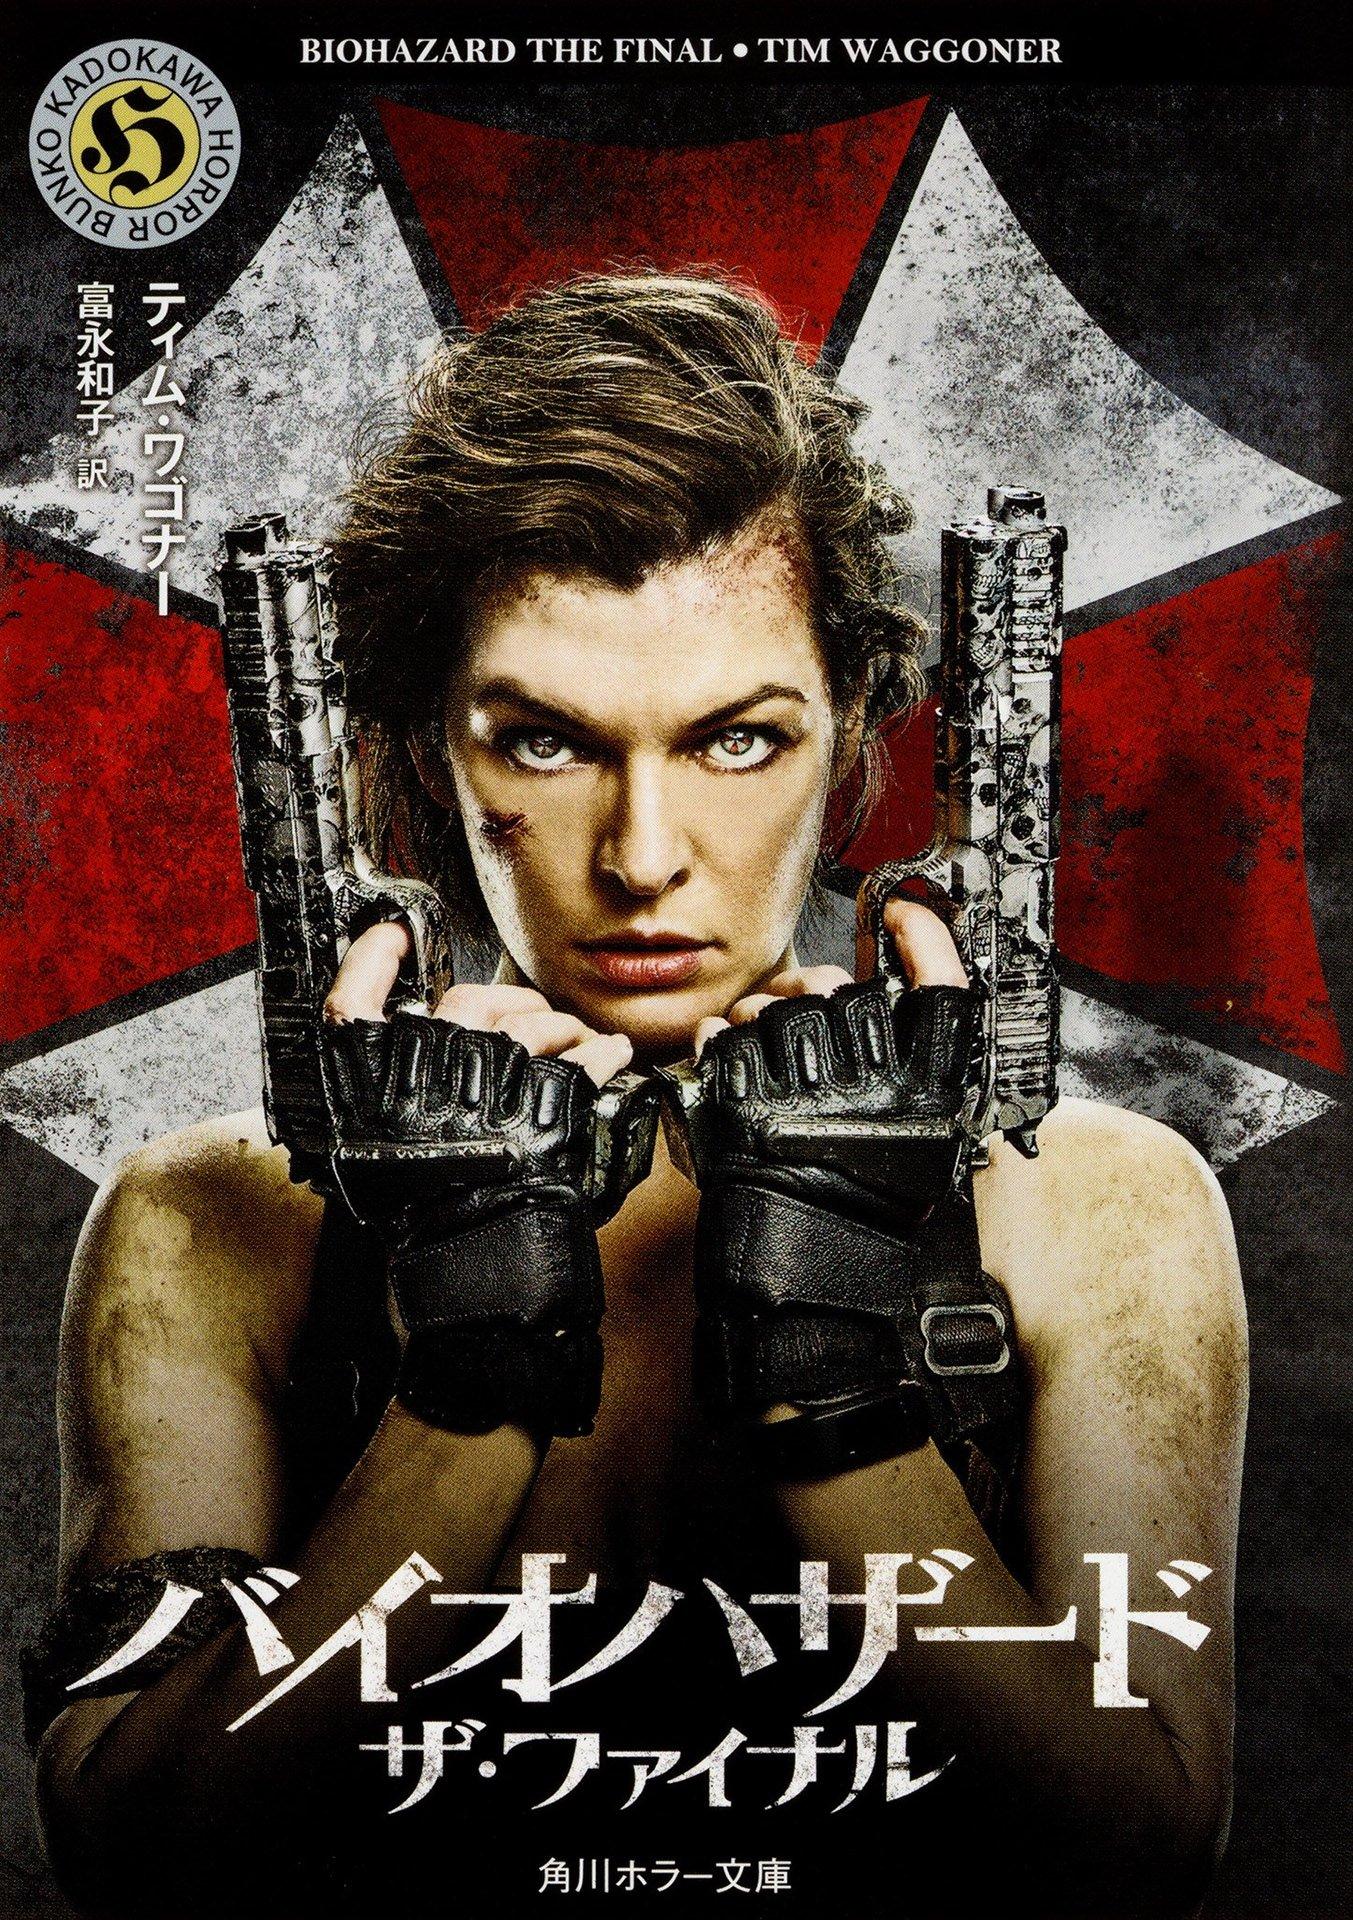 Biohazard: The Final (Japan)